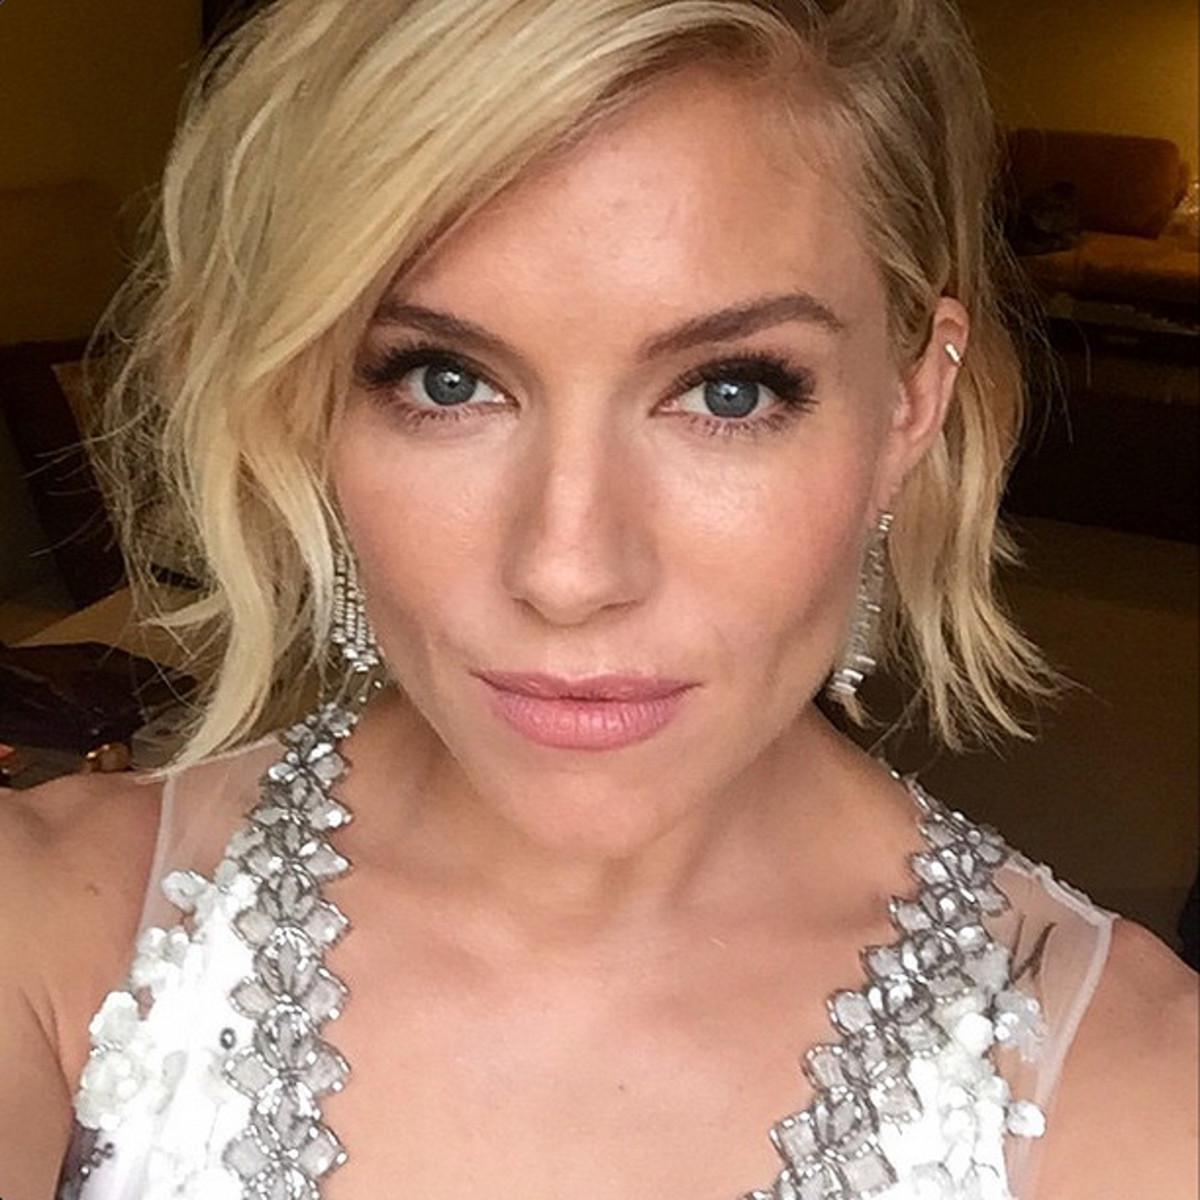 Sienna Miller Golden Globes makeup by Charlotte Tilbury via instagram/ctilburymakeup